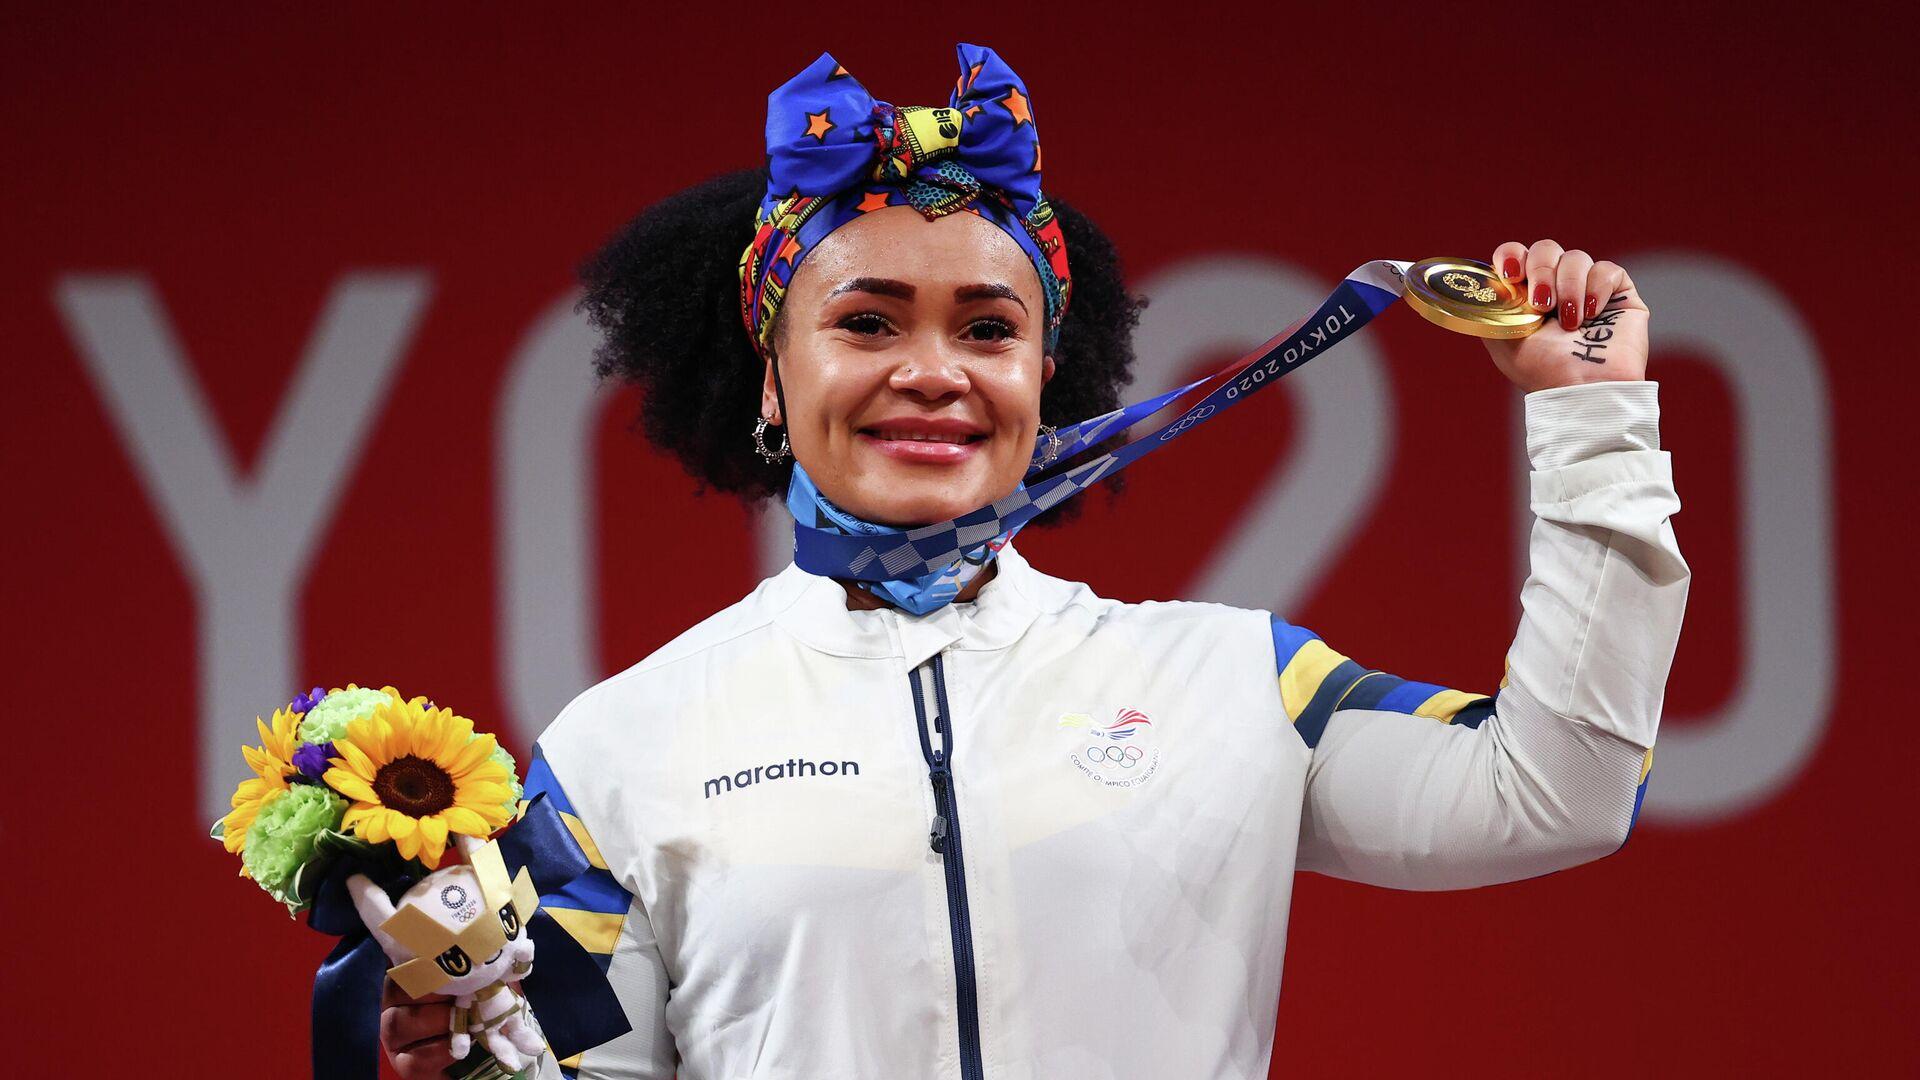 La halterófila ecuatoriana Neisi Dajomes con su medalla de oro, Tokio, el 1 de agosto de 2021 - Sputnik Mundo, 1920, 01.08.2021